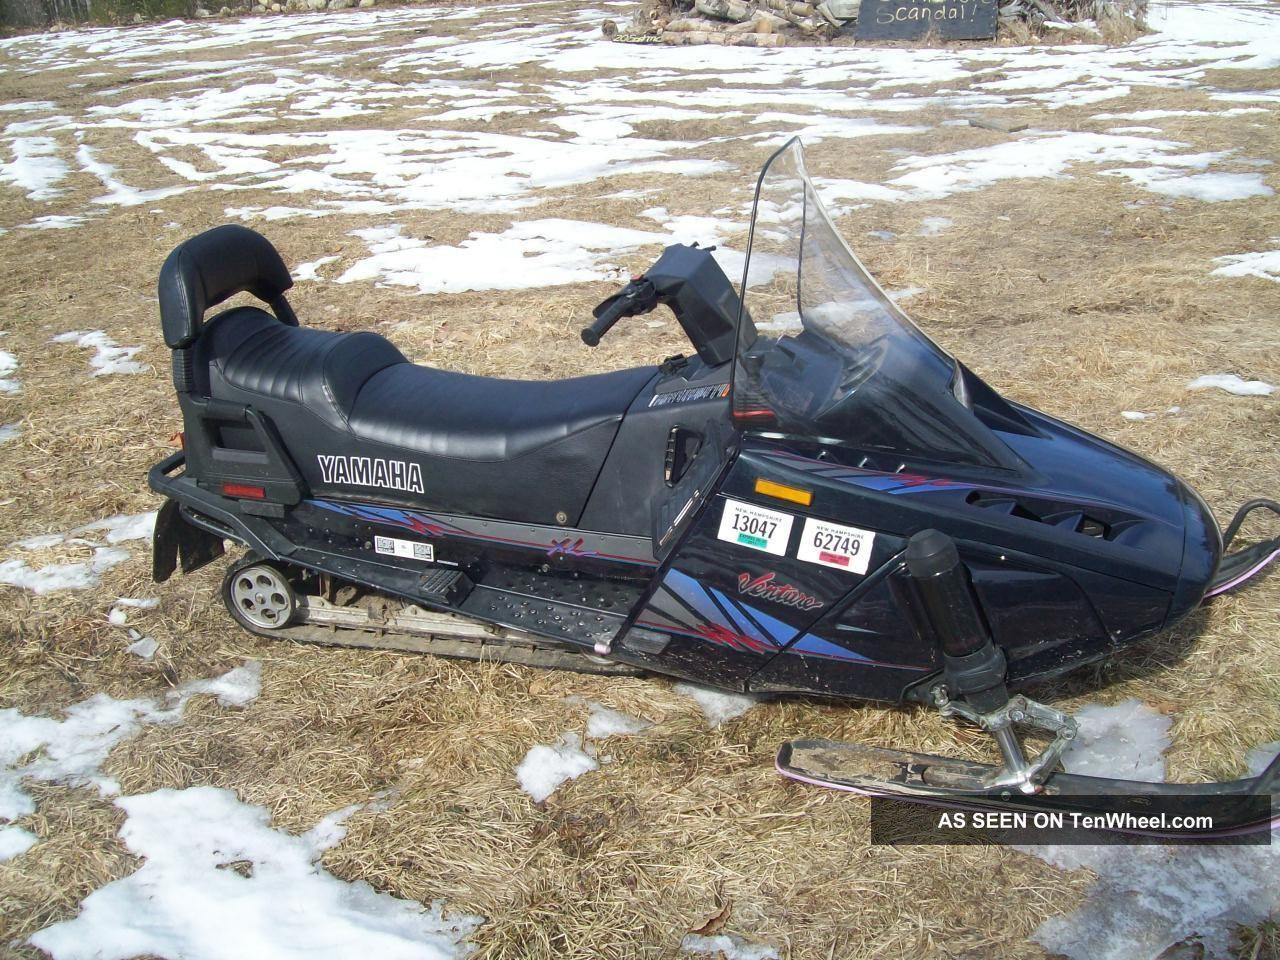 Yamaha Venture Snowmobile Specs